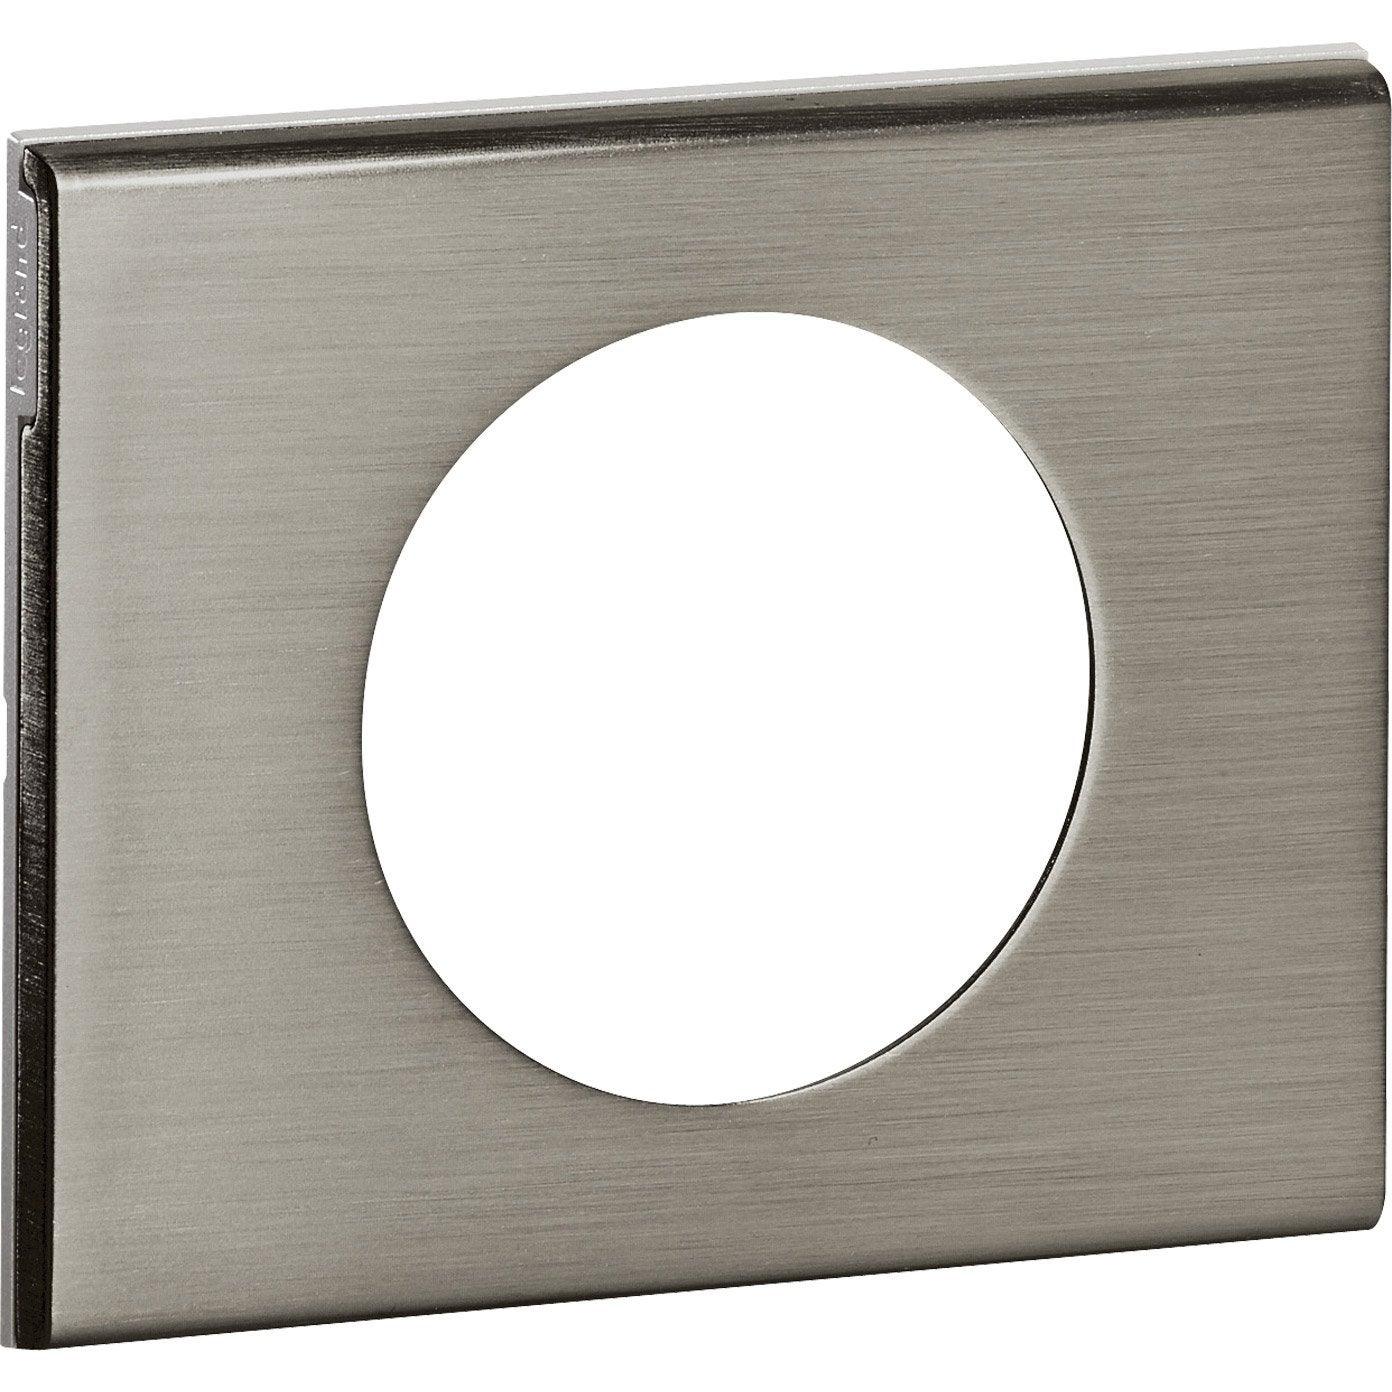 plaque simple legrand celiane inox. Black Bedroom Furniture Sets. Home Design Ideas